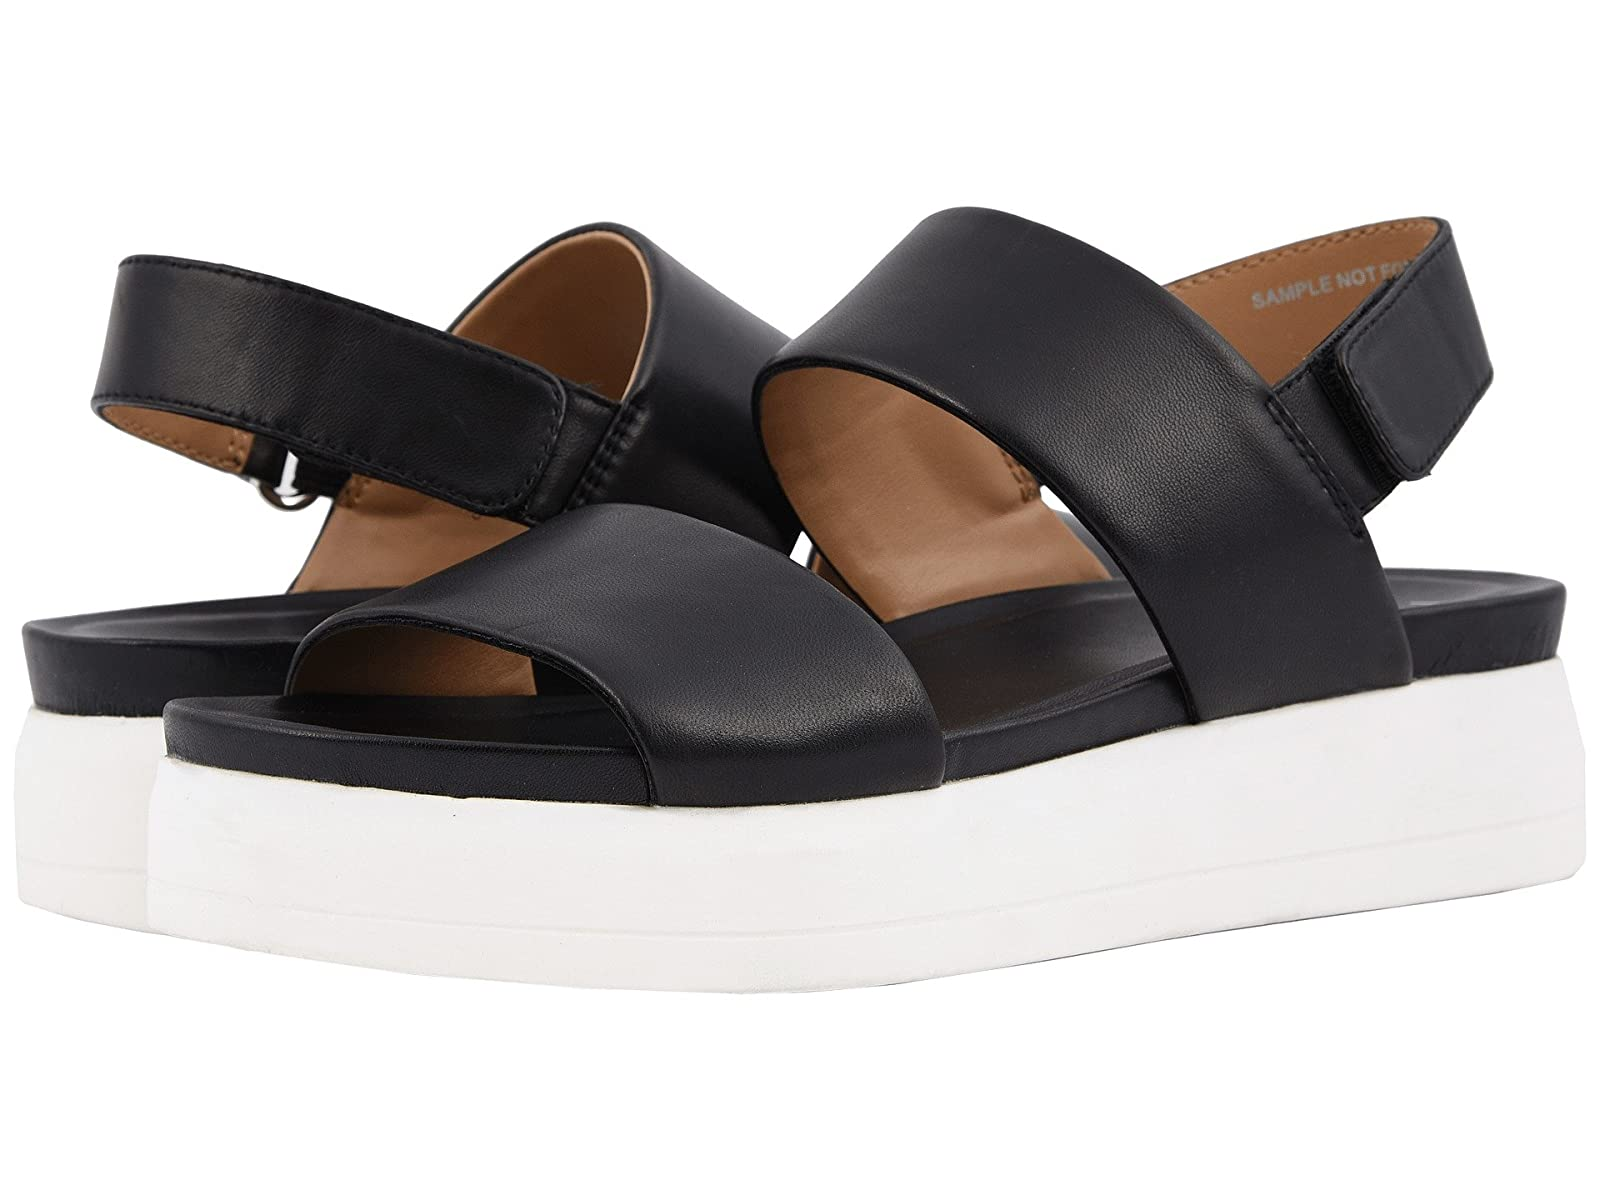 Franco Sarto KenanAtmospheric grades have affordable shoes